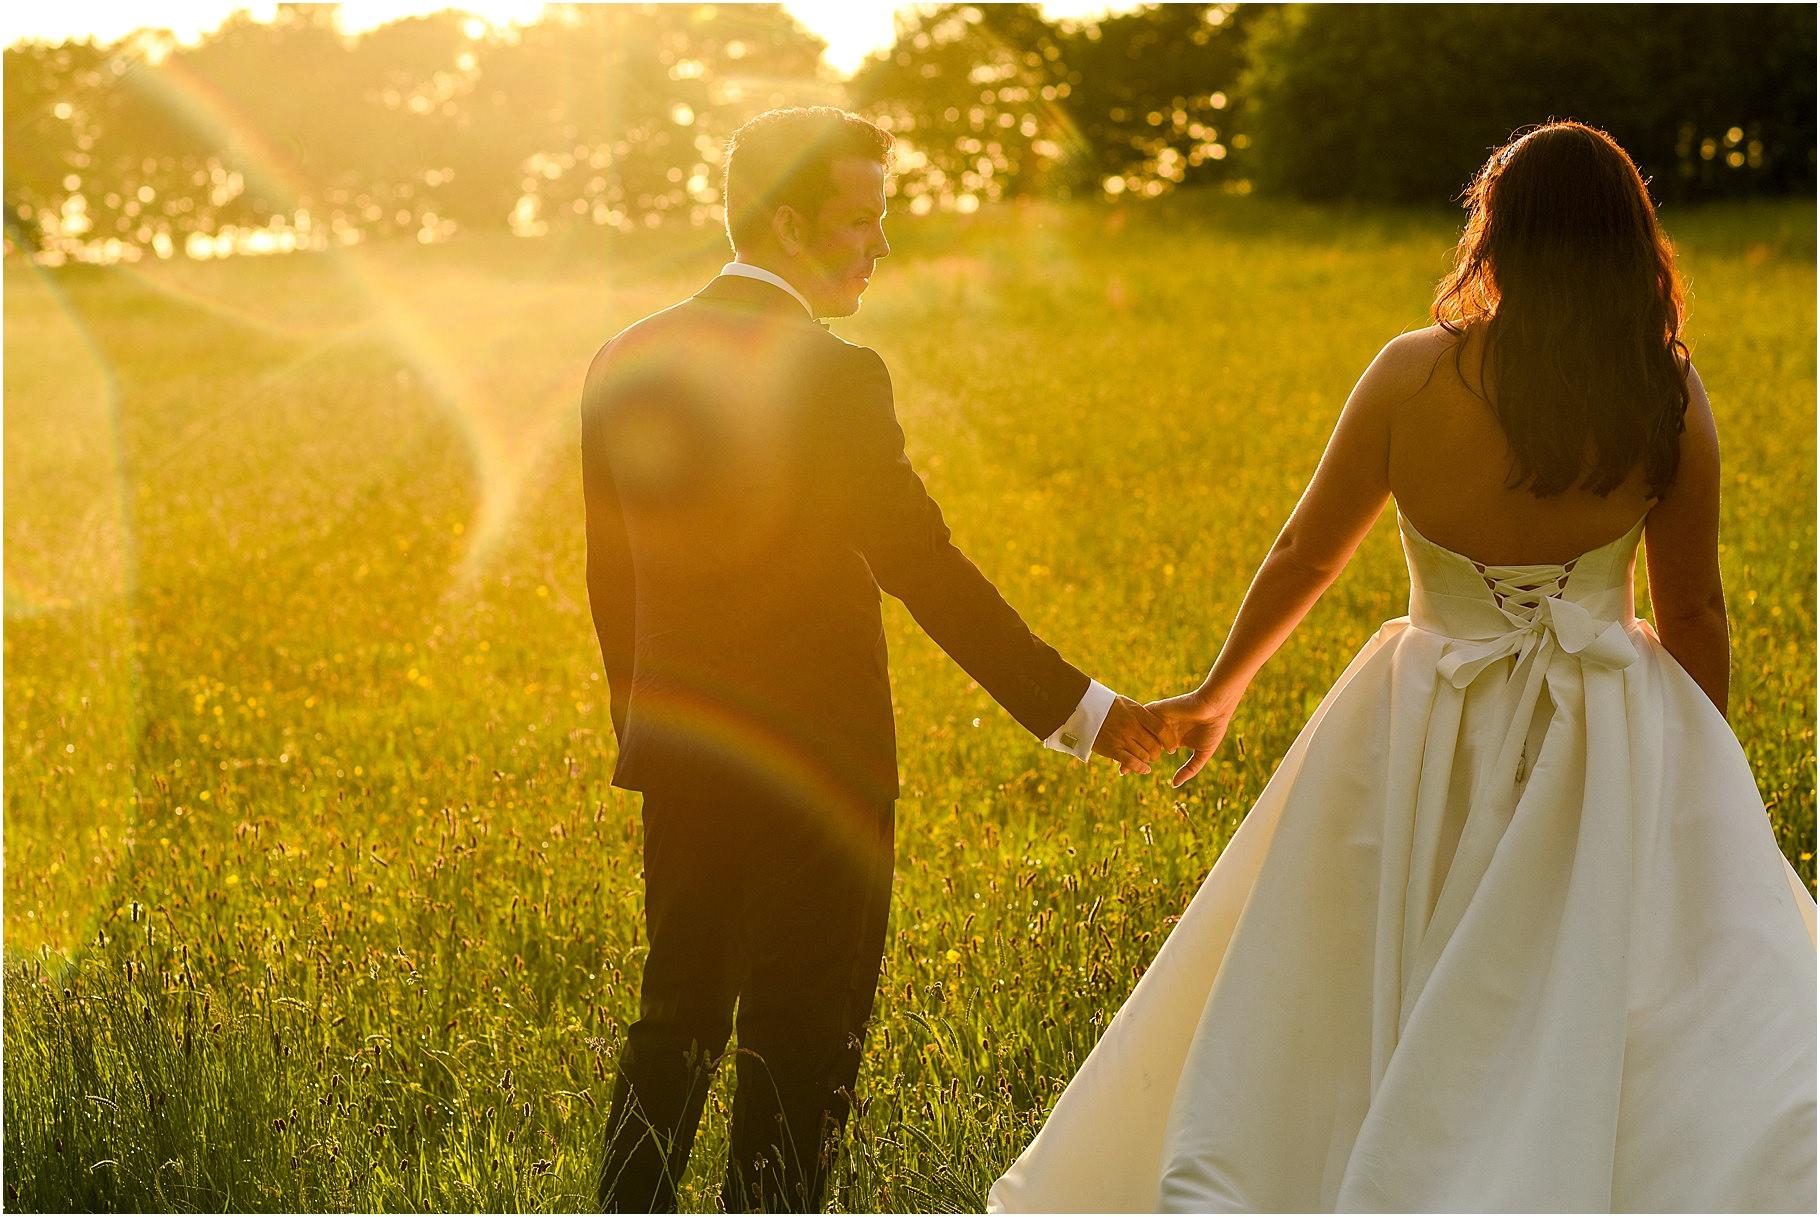 dan-wootton-photography-2017-weddings-047.jpg